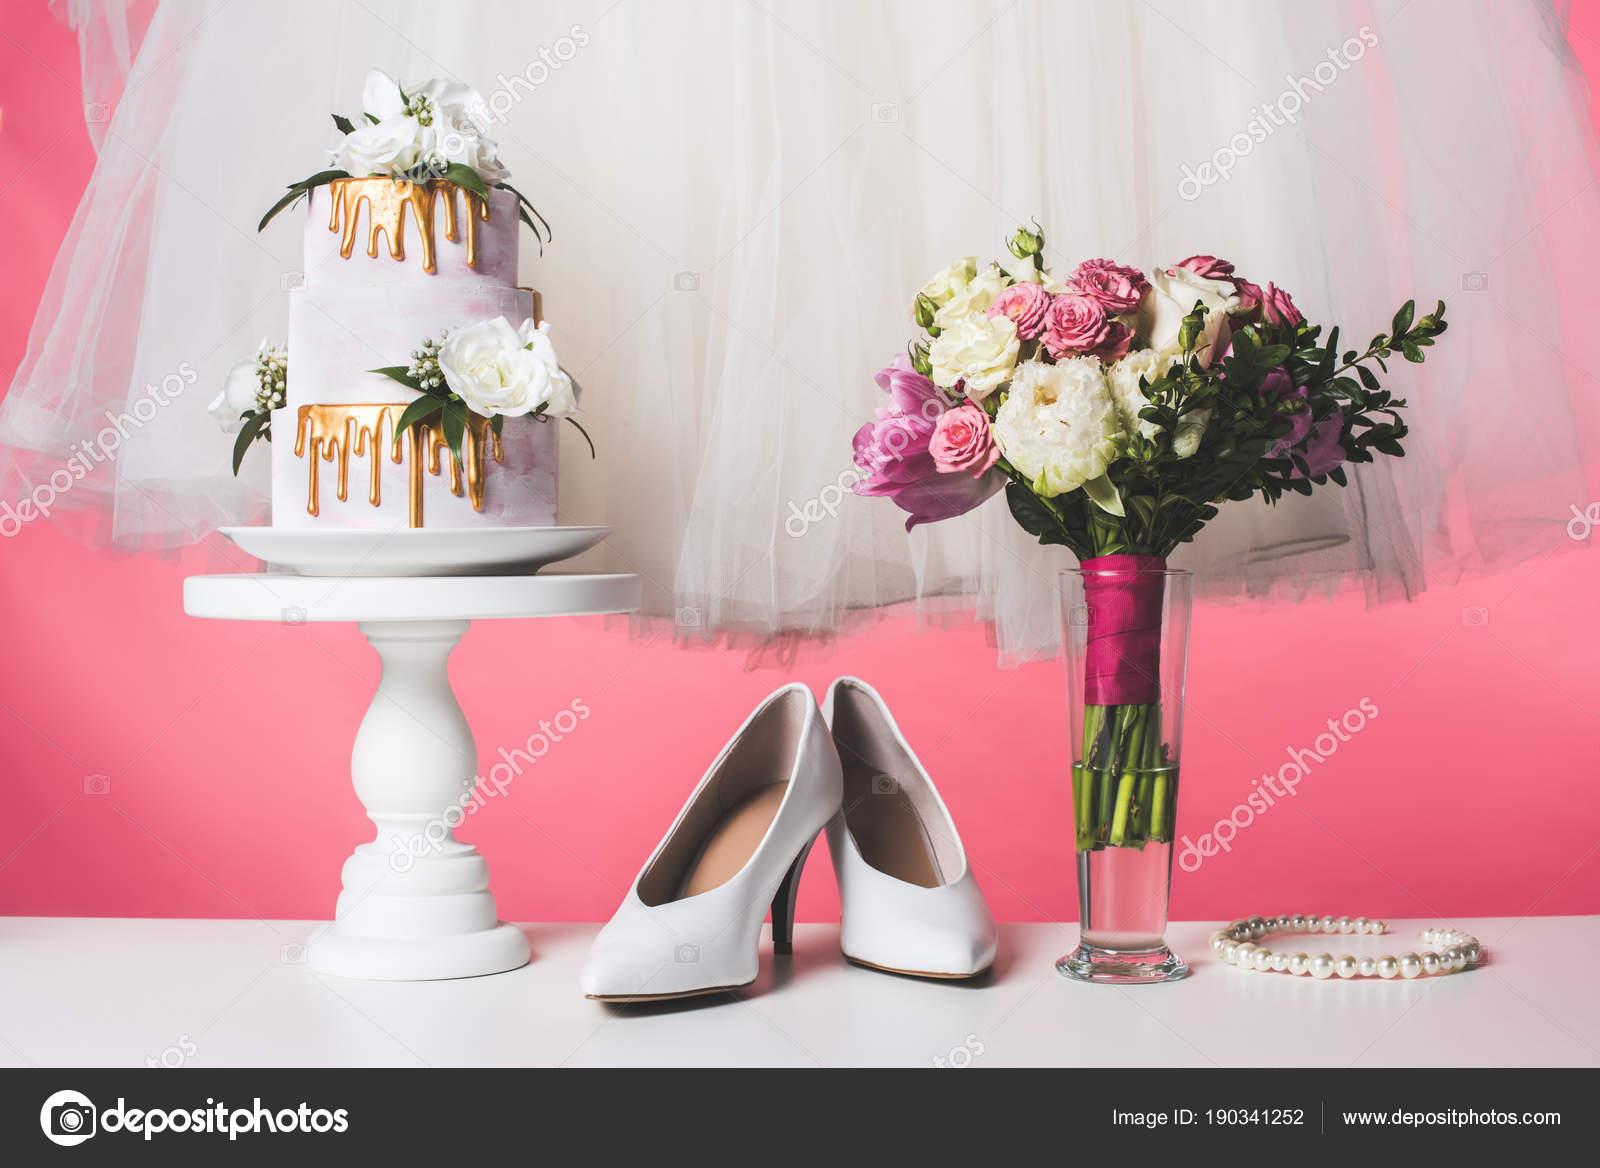 Pastel Boda Soporte Torta Con Vestido Blanco Ramo Aislado Rosa ...